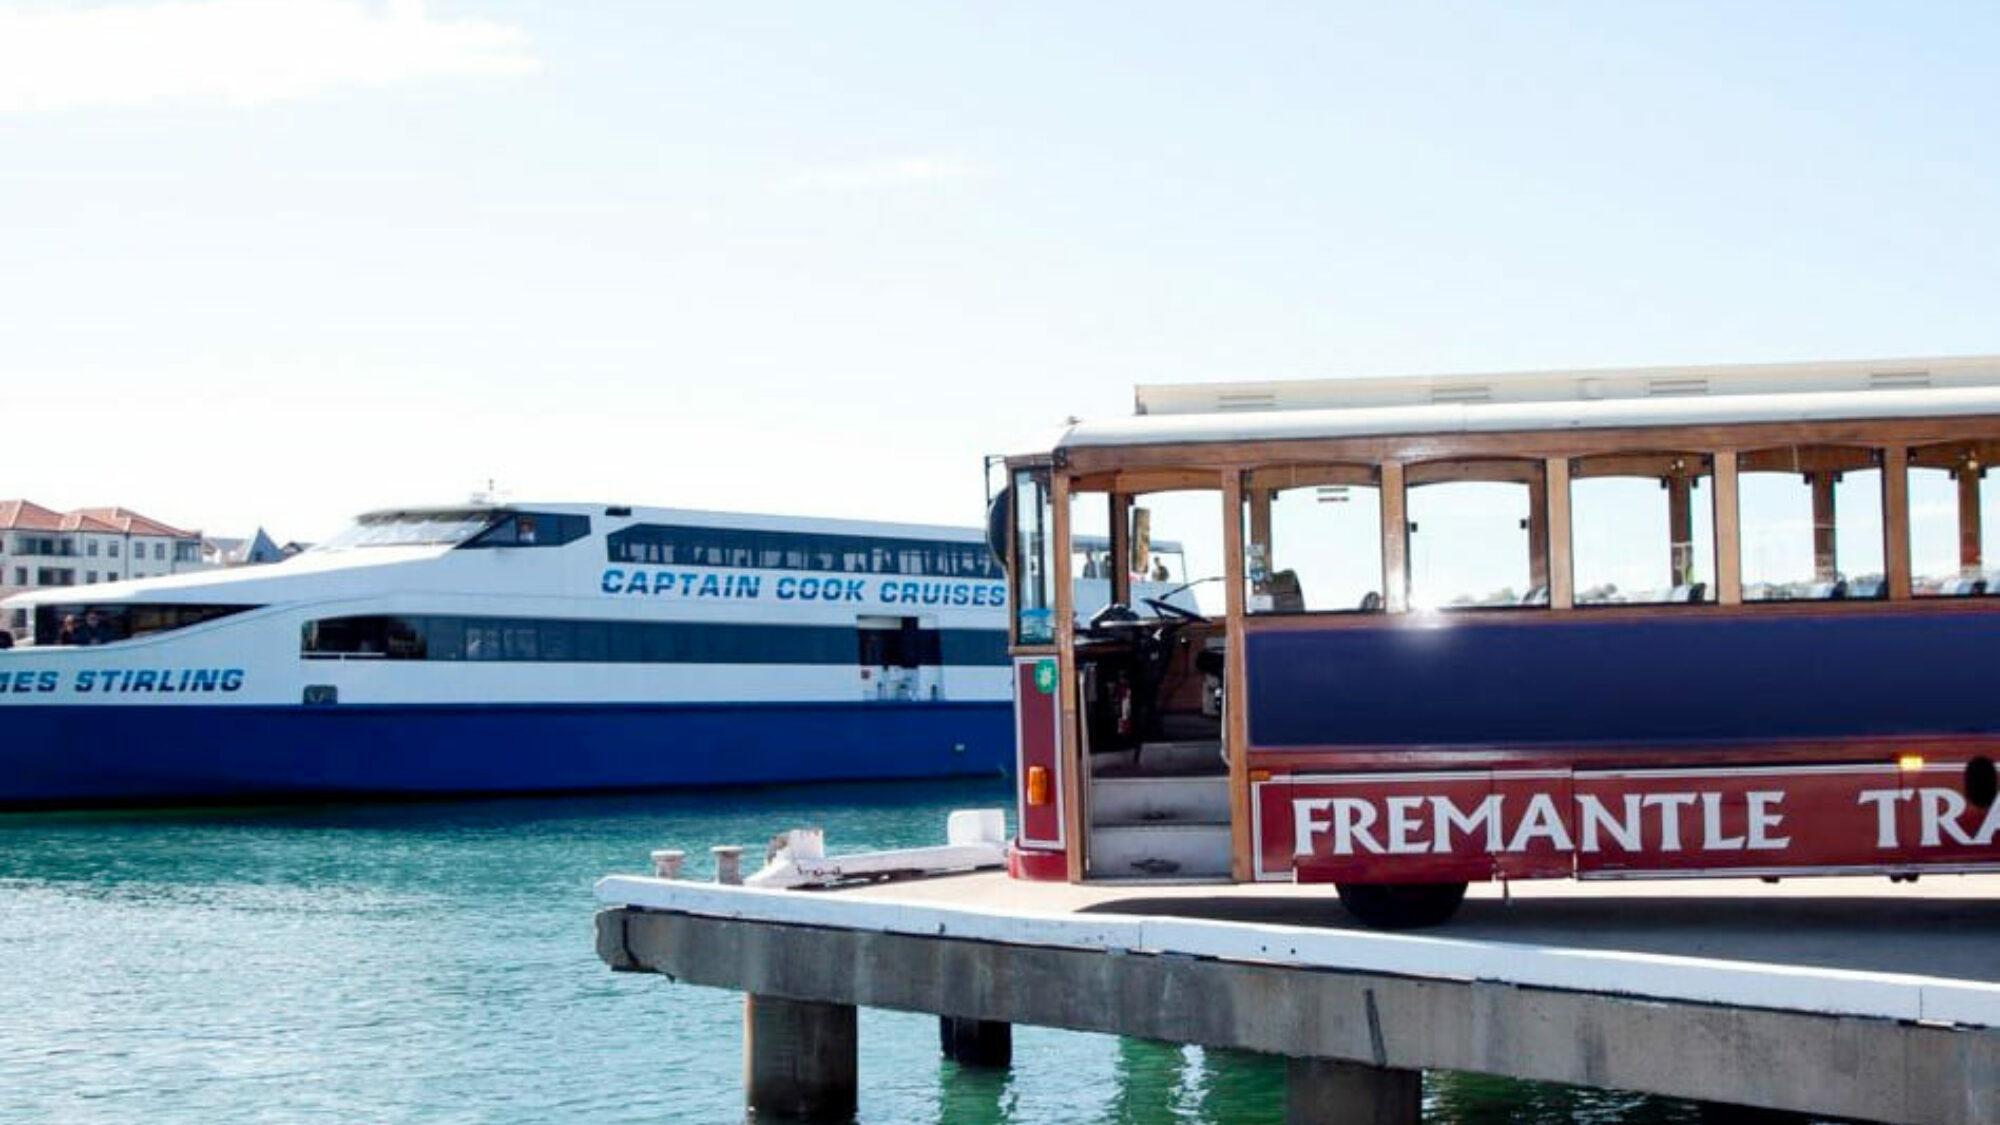 Fremantle museum tram